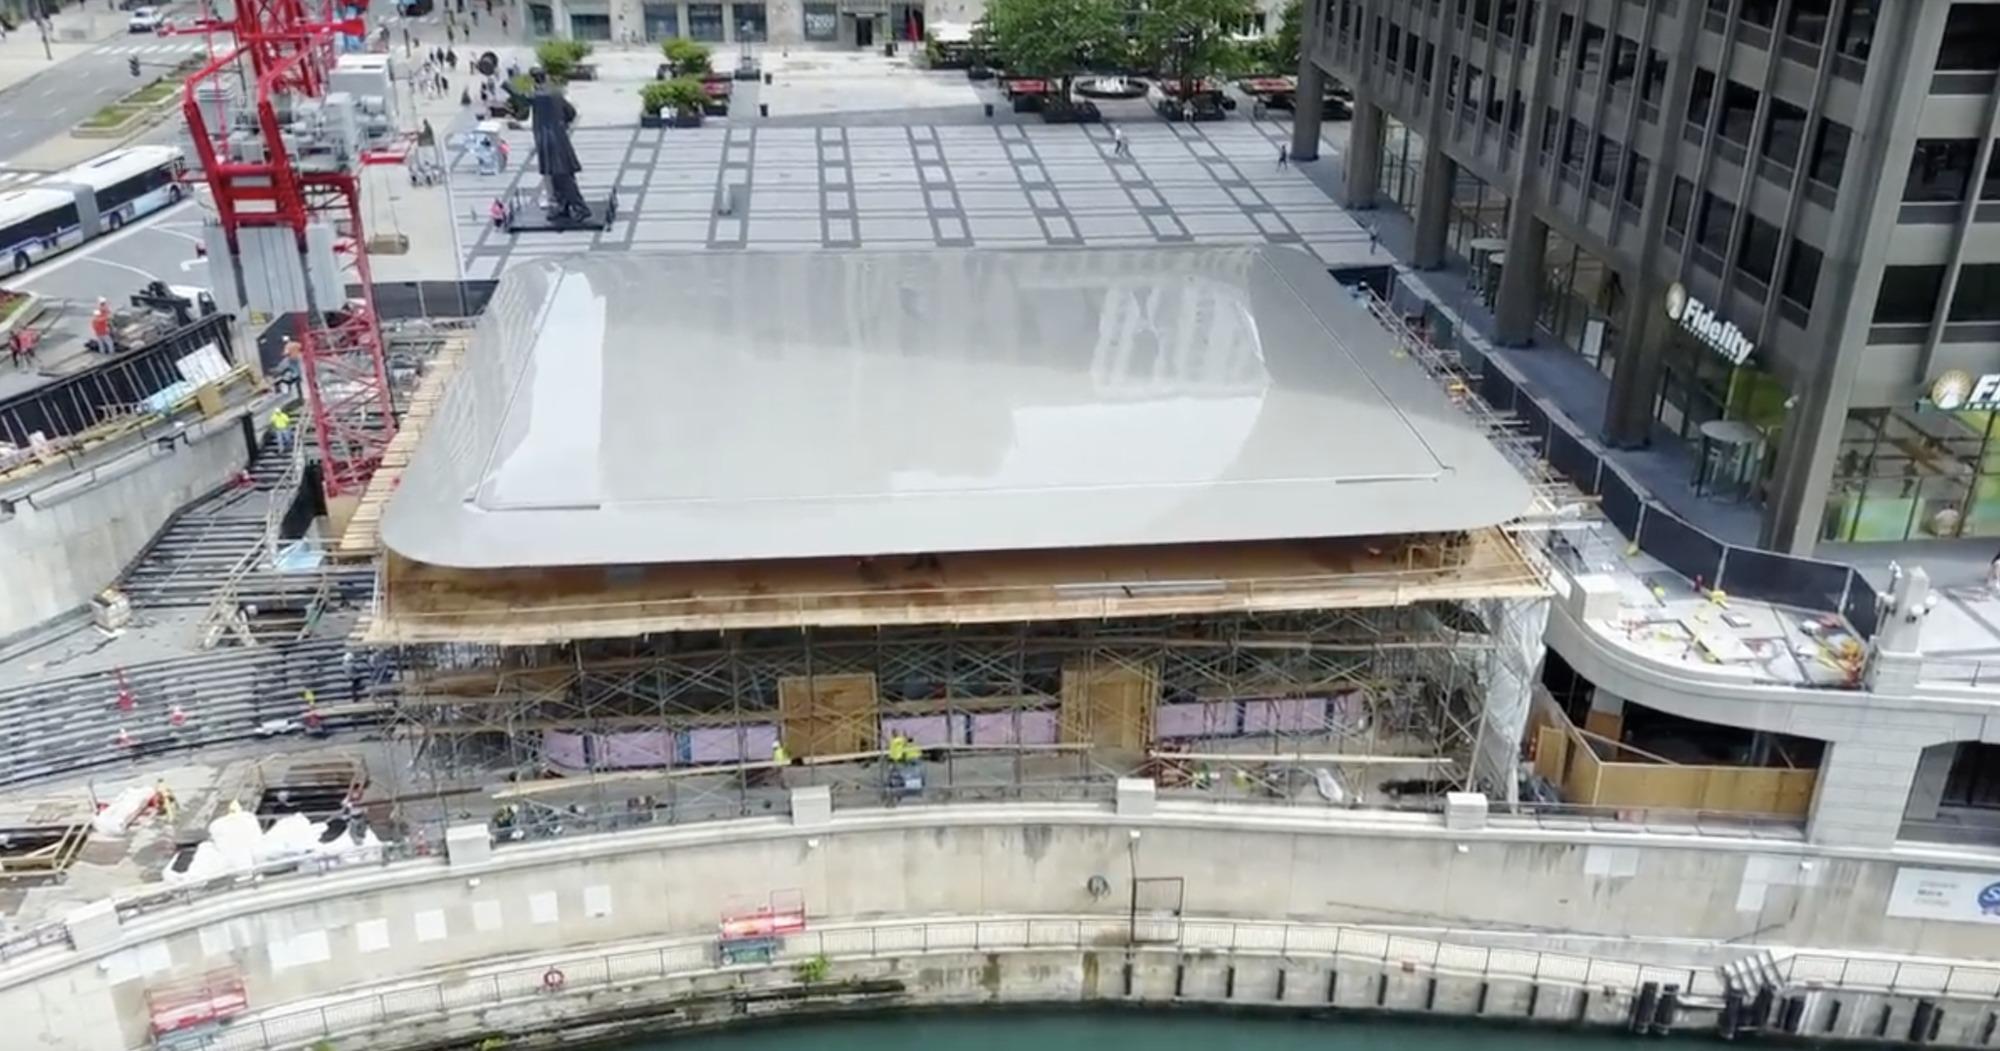 Chicago S New Apple Store Installs Giant Macbook Roof